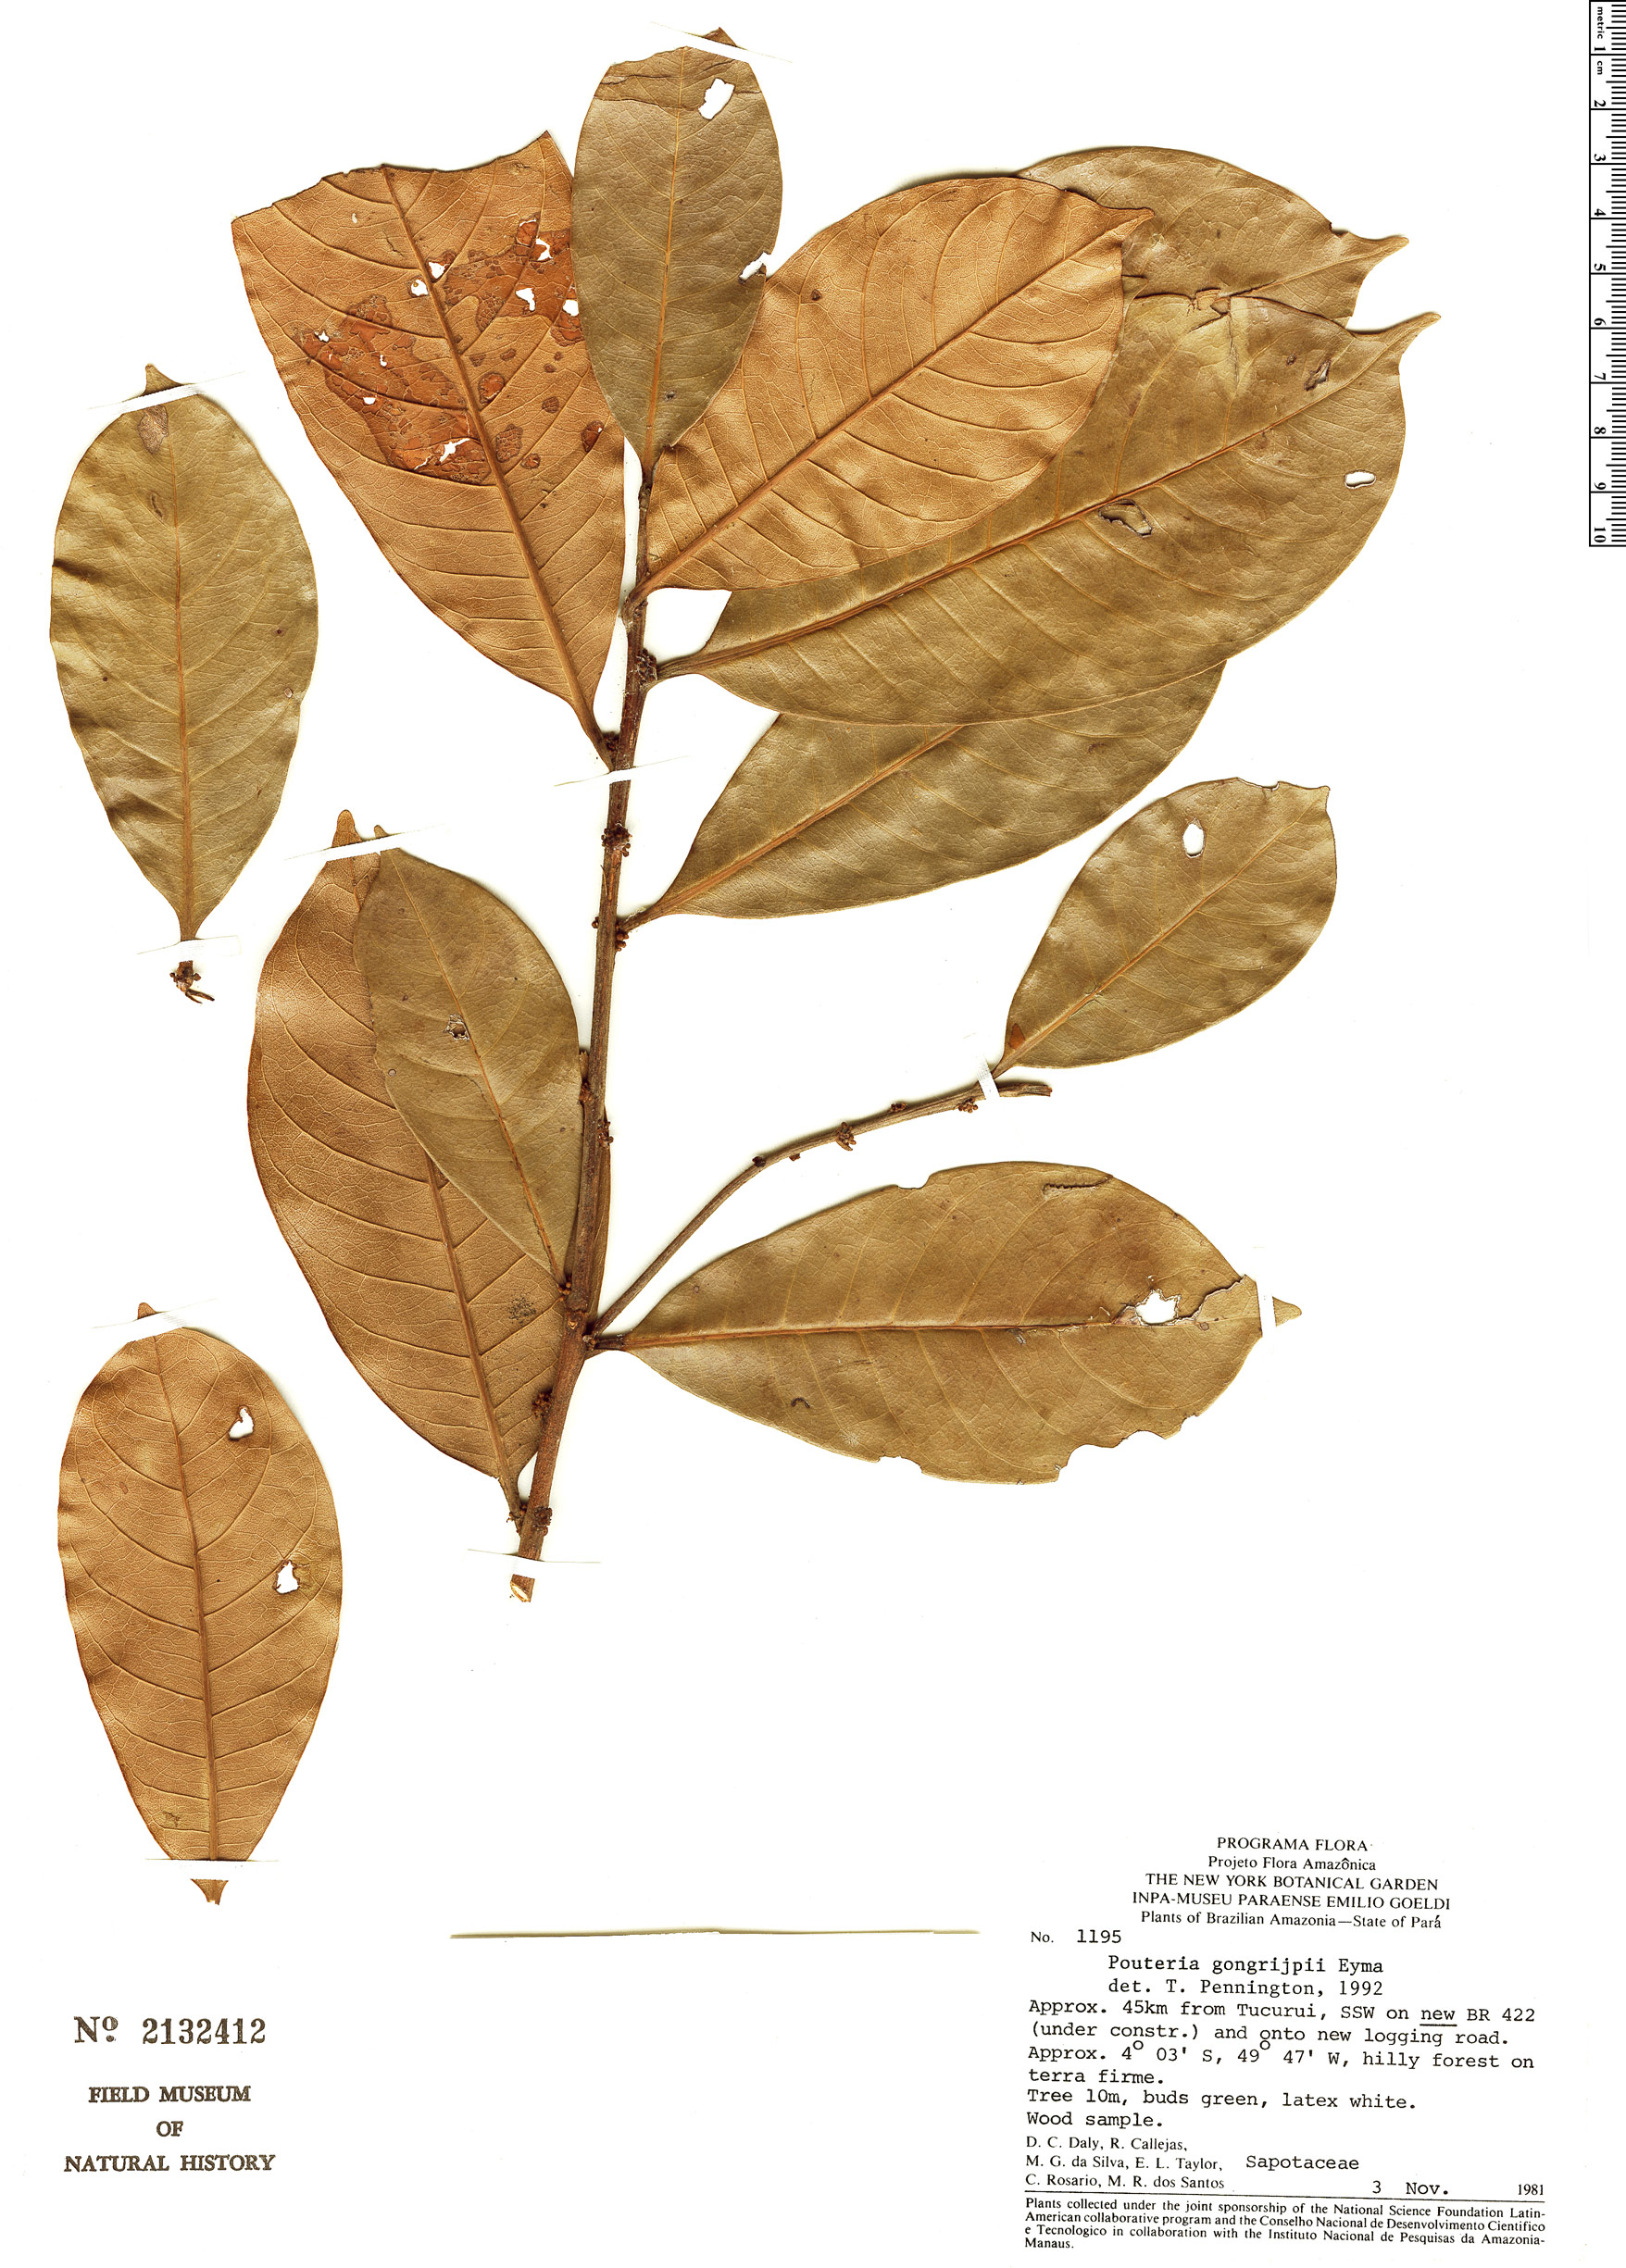 Specimen: Pouteria gongrijpii